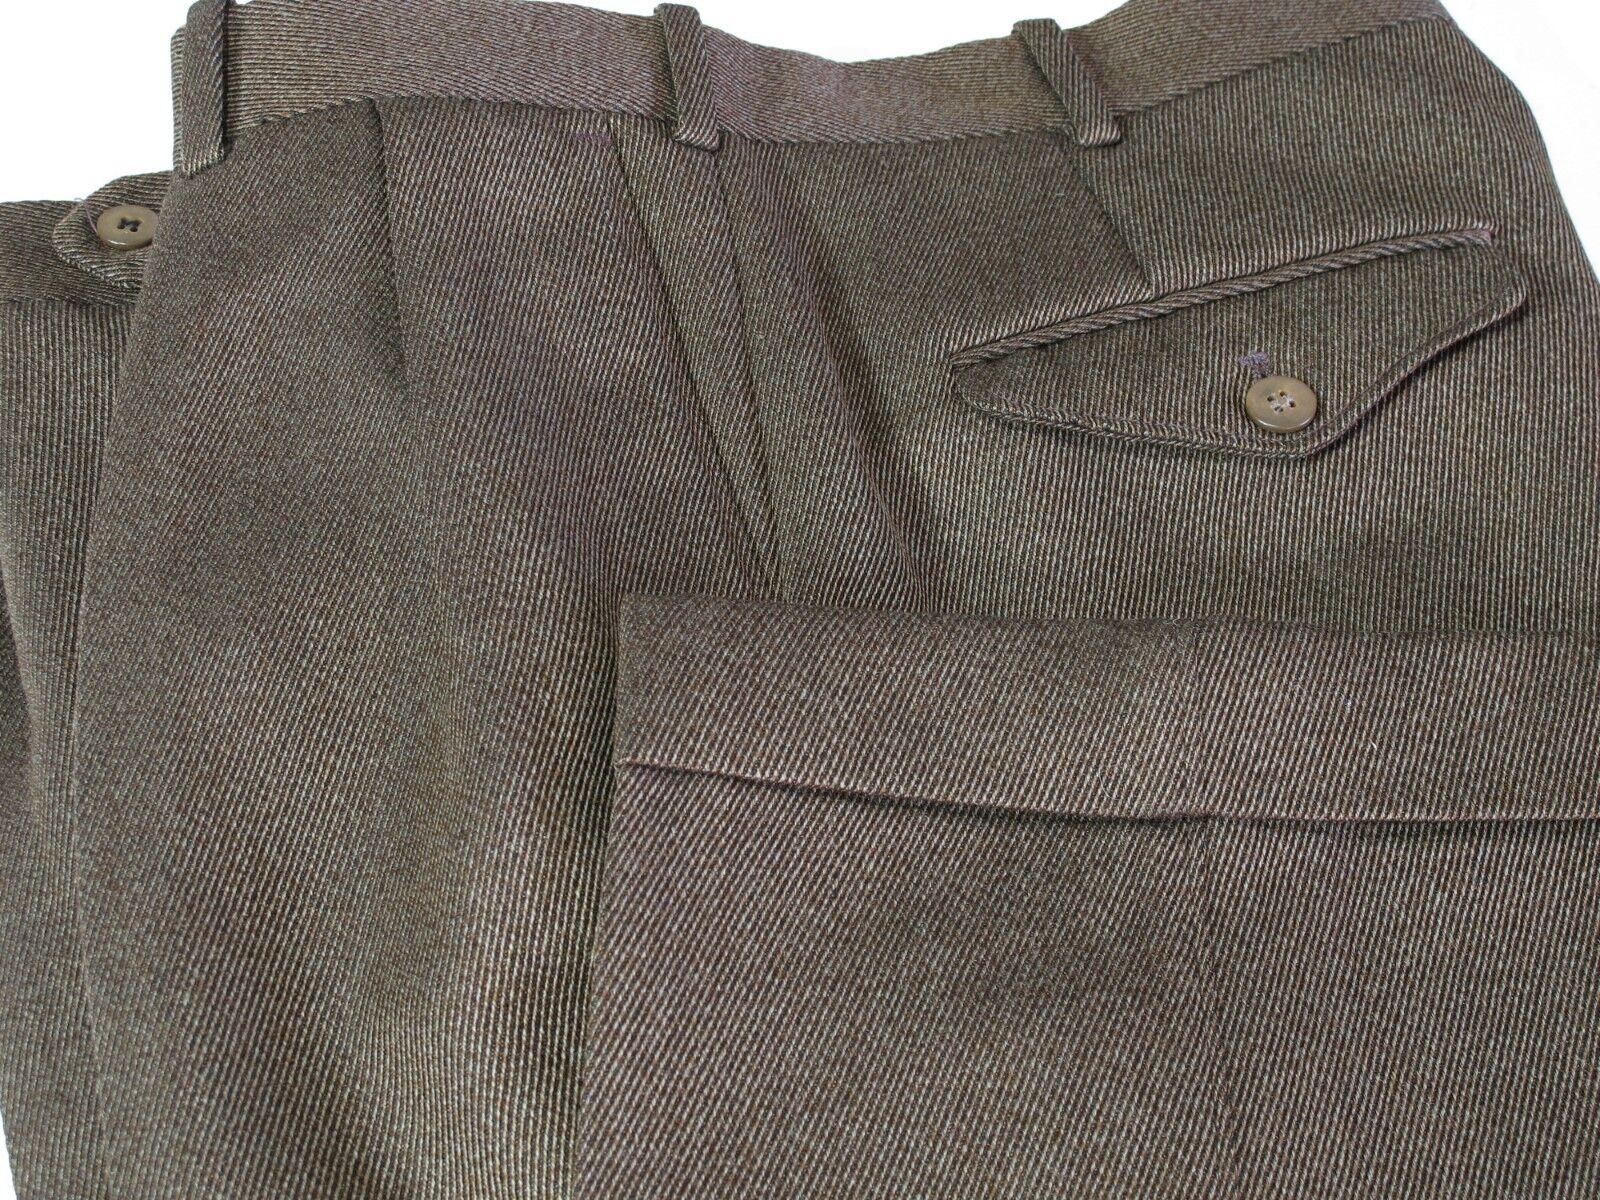 PAUL STUART Dress Pants 34 Short, Olive Brown Cogreen Twill  Wool